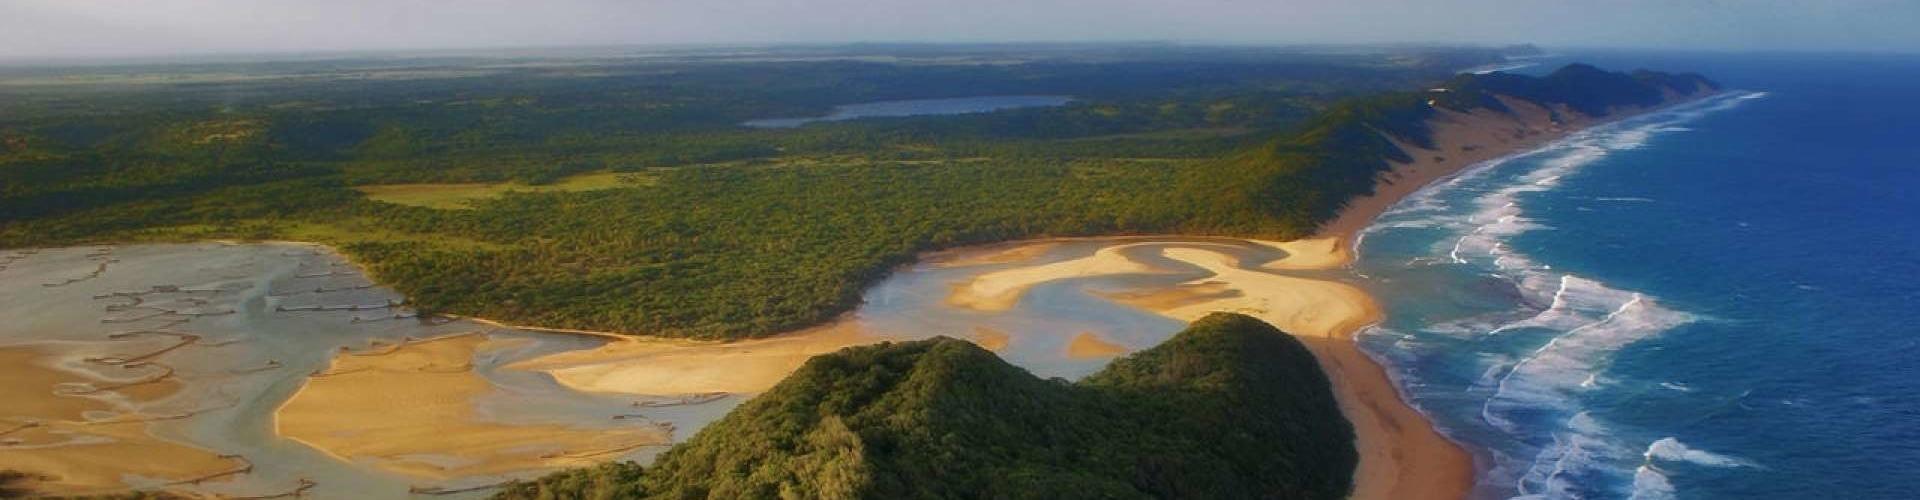 isimangaliso-wetland-park-zuid-afrika-header